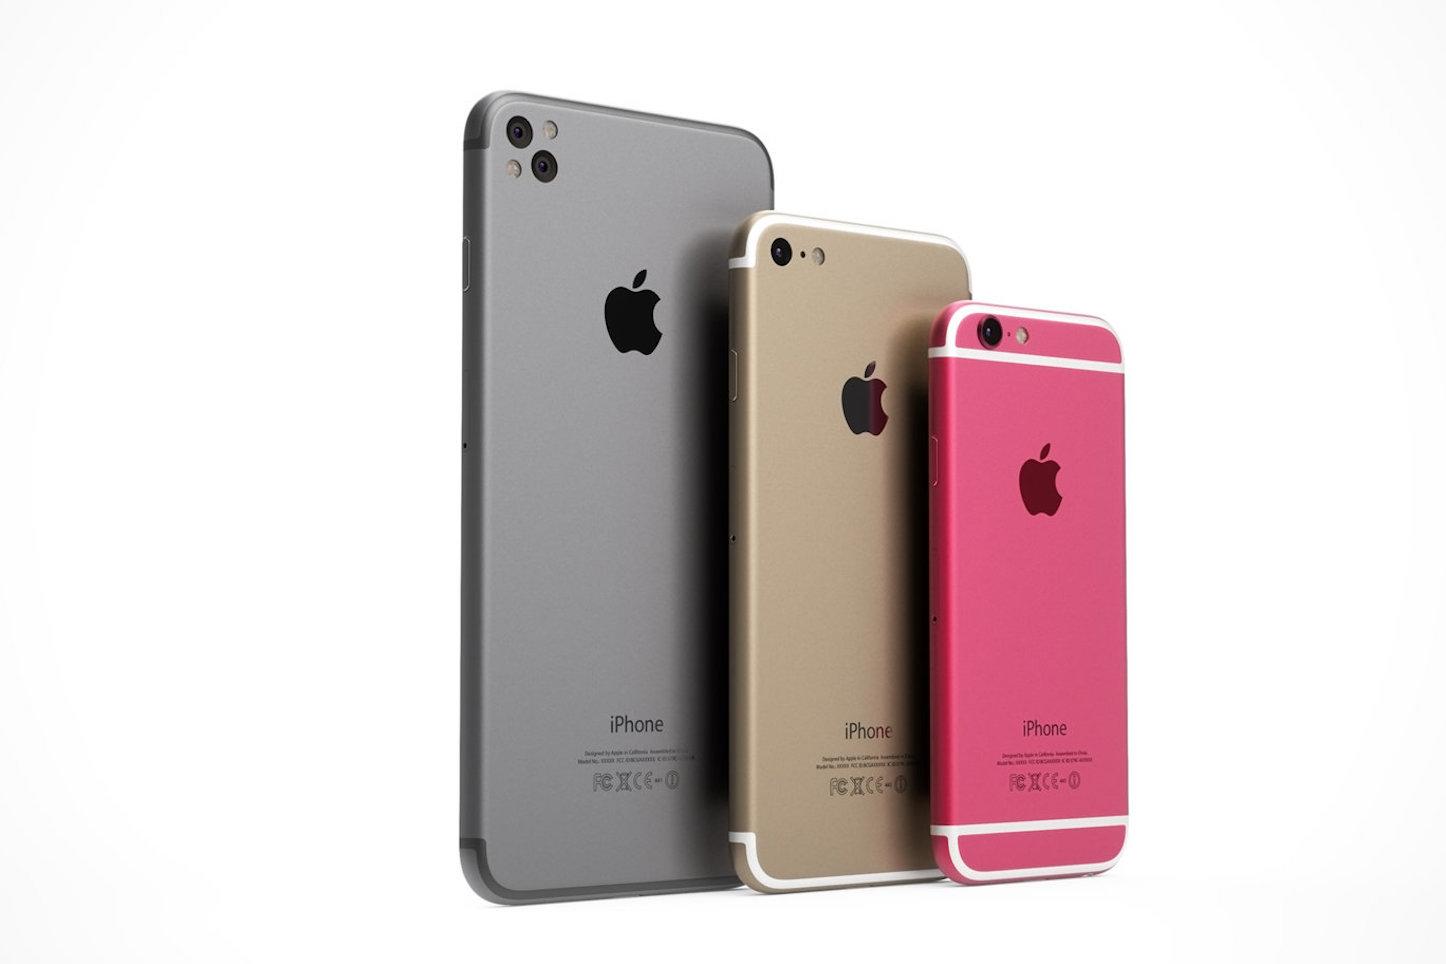 iphone5se-pink-color-concept-image-7.jpg